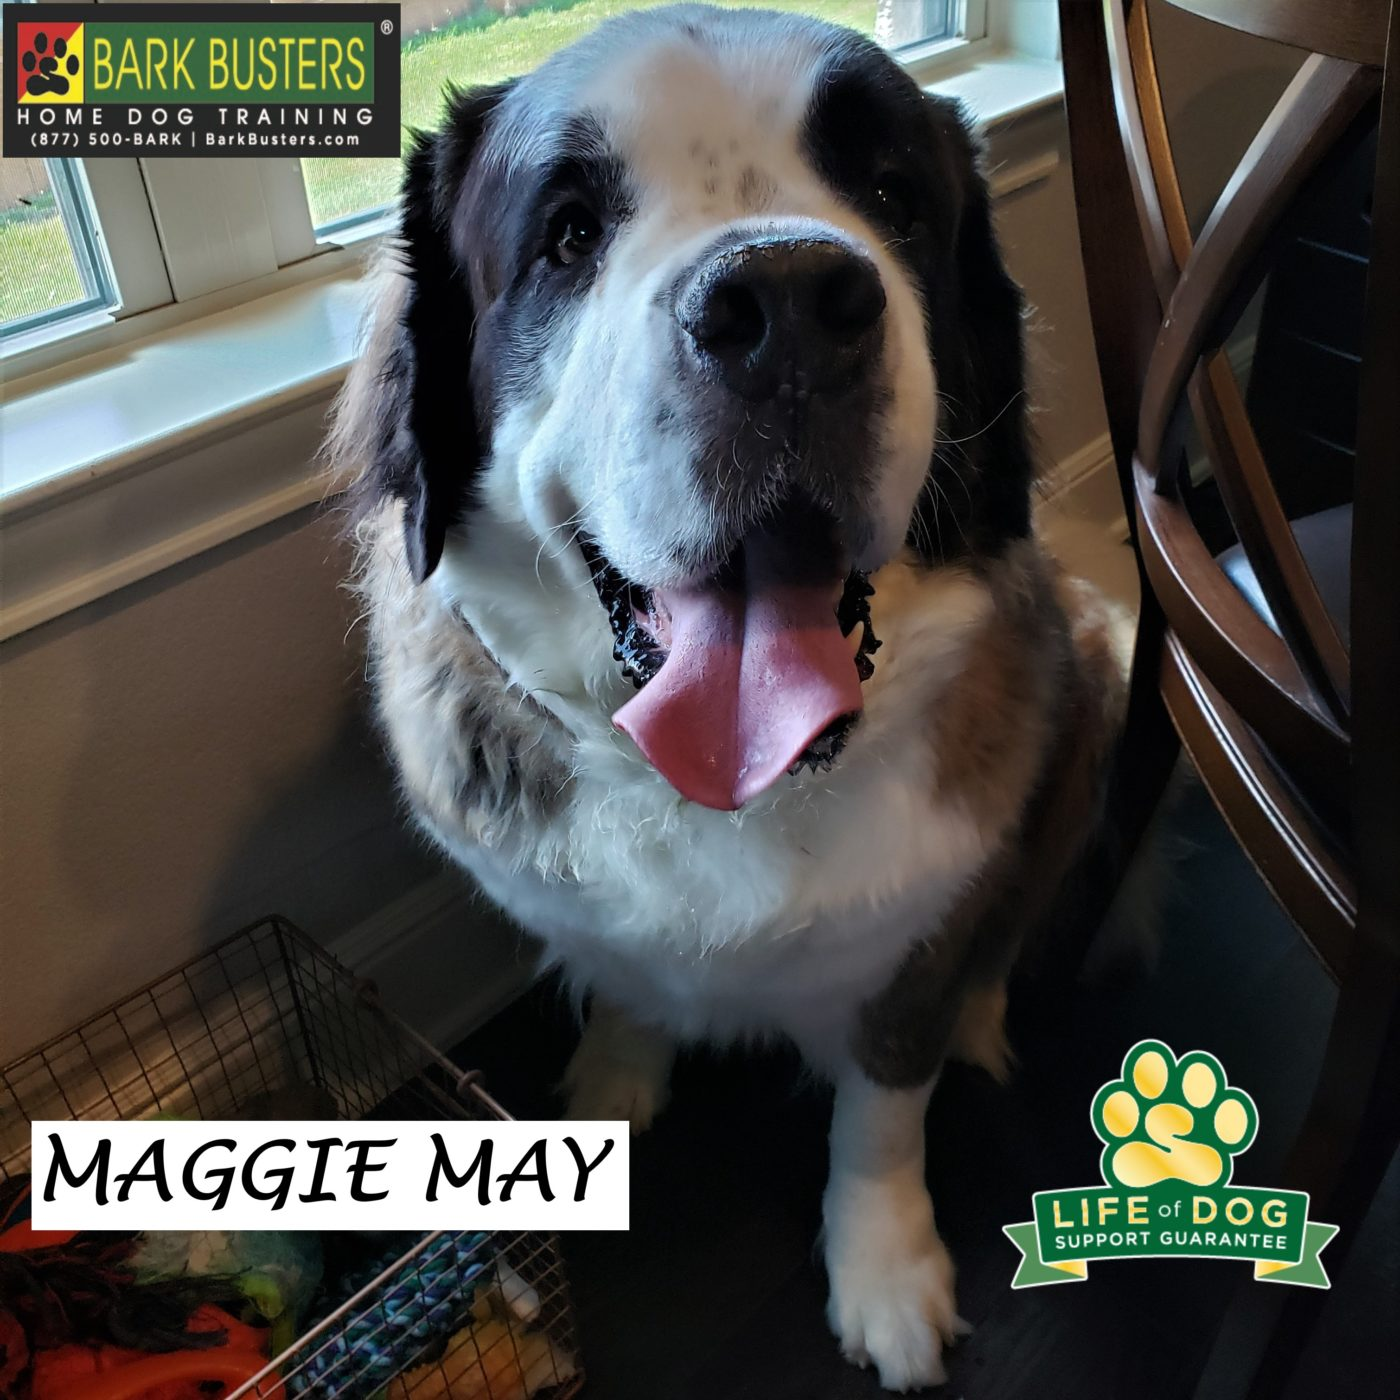 #saintbernard #stbernard #bigdogproblems #dogtraininggeorgetown #dogtrainerroundrock #dogtrainernearme #leashtraining #doormanners #barkbusters #speakdog #inhomedogtraining